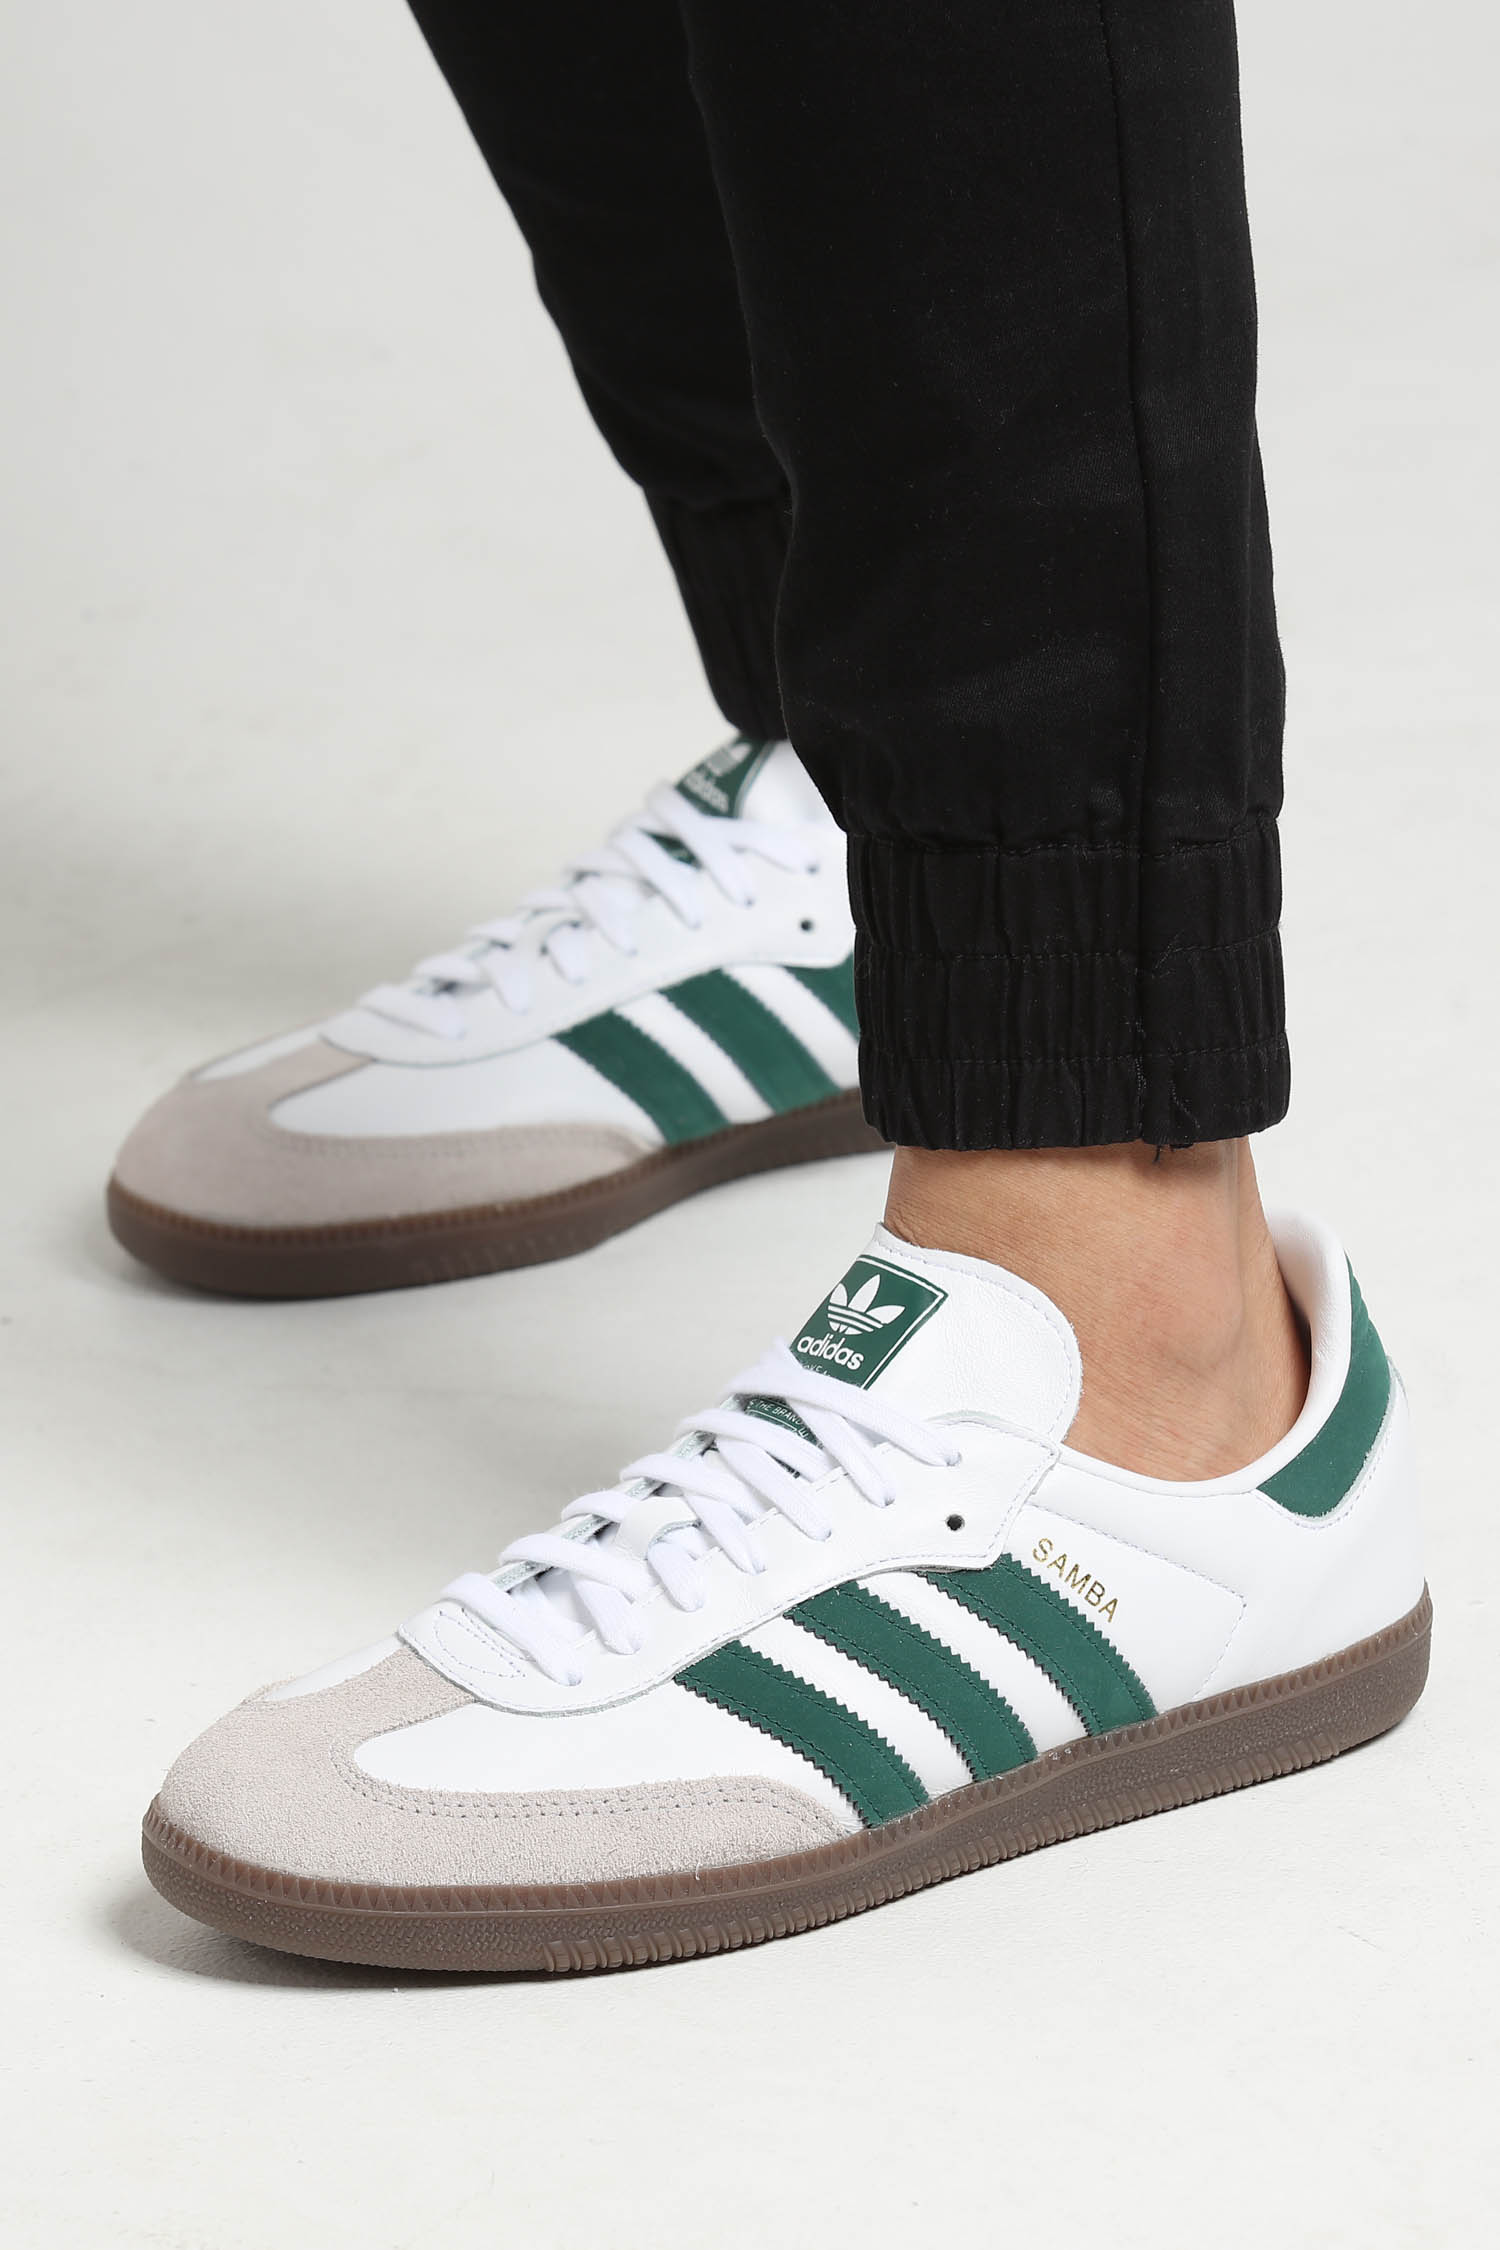 Adidas Samba OG White/Green | Culture